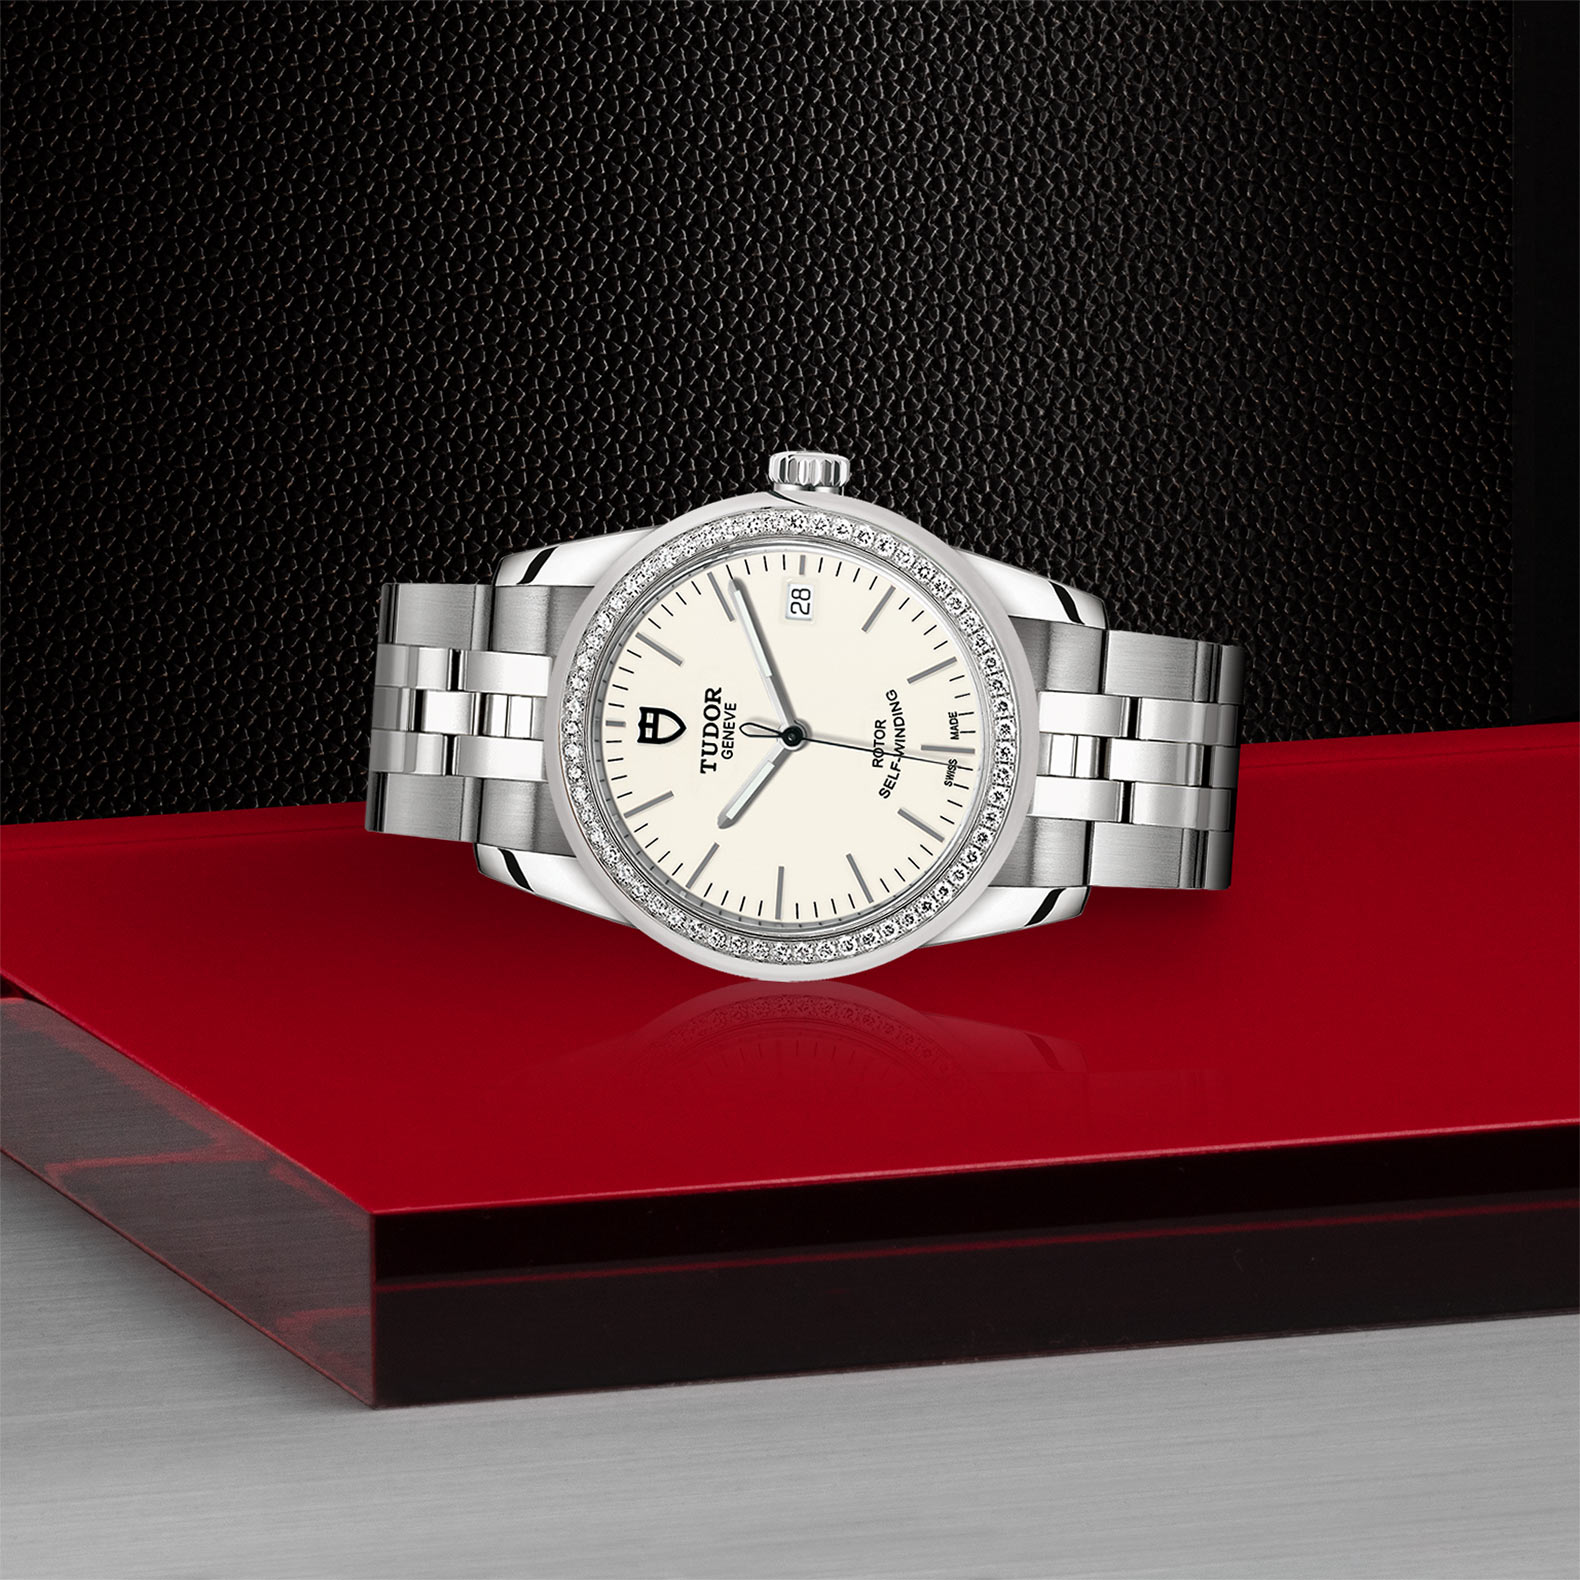 TUDOR Glamour Date - M55020-0095